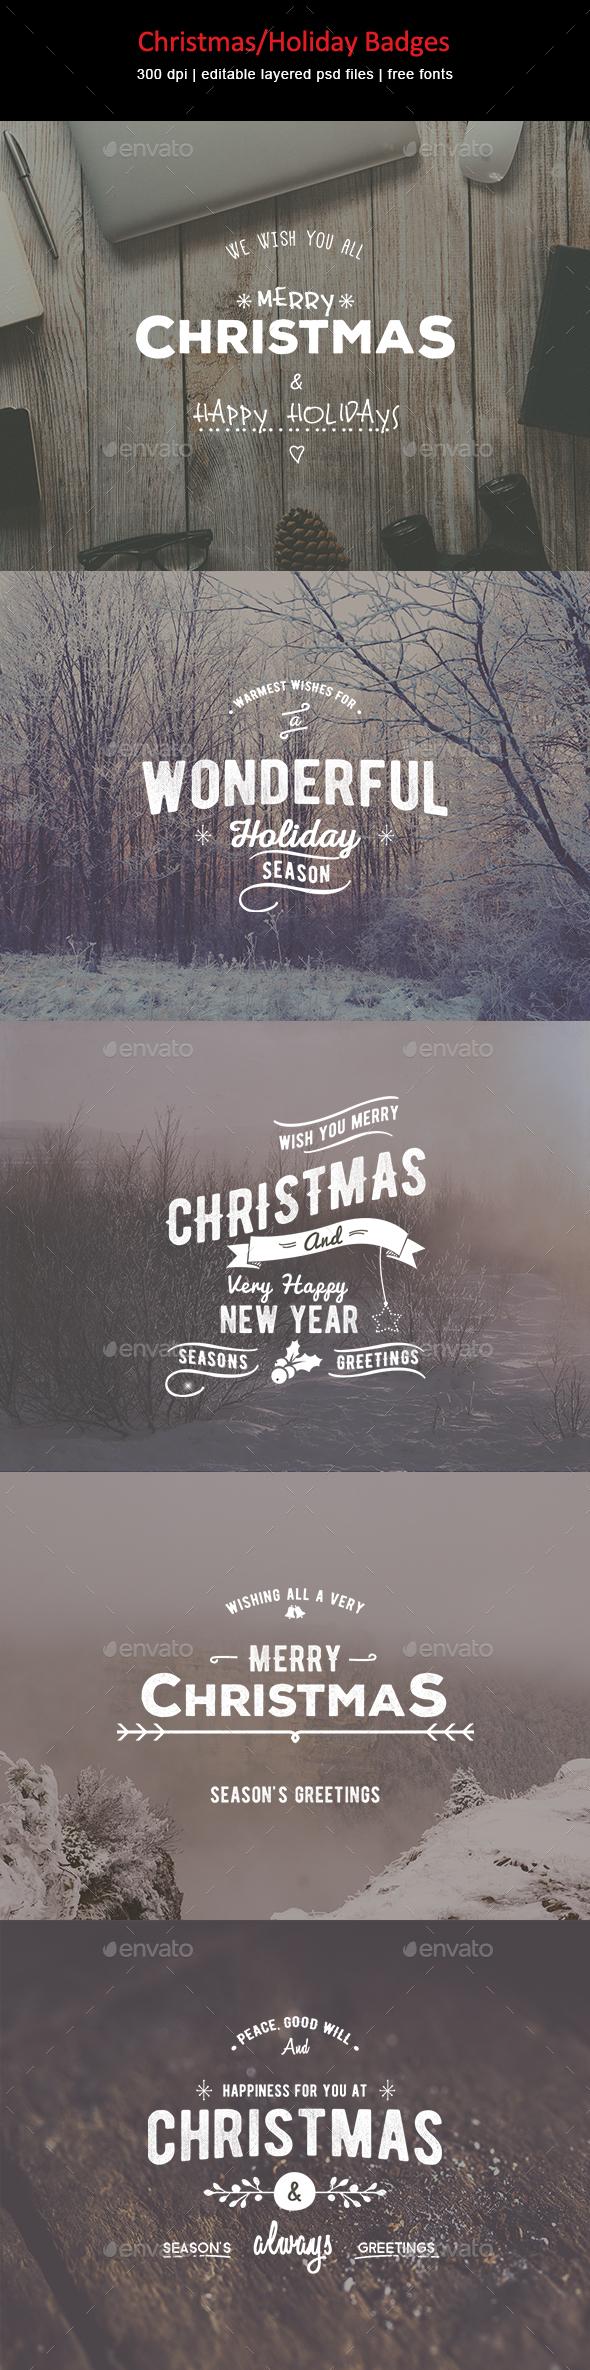 Christmas/Holiday Badges - Badges & Stickers Web Elements